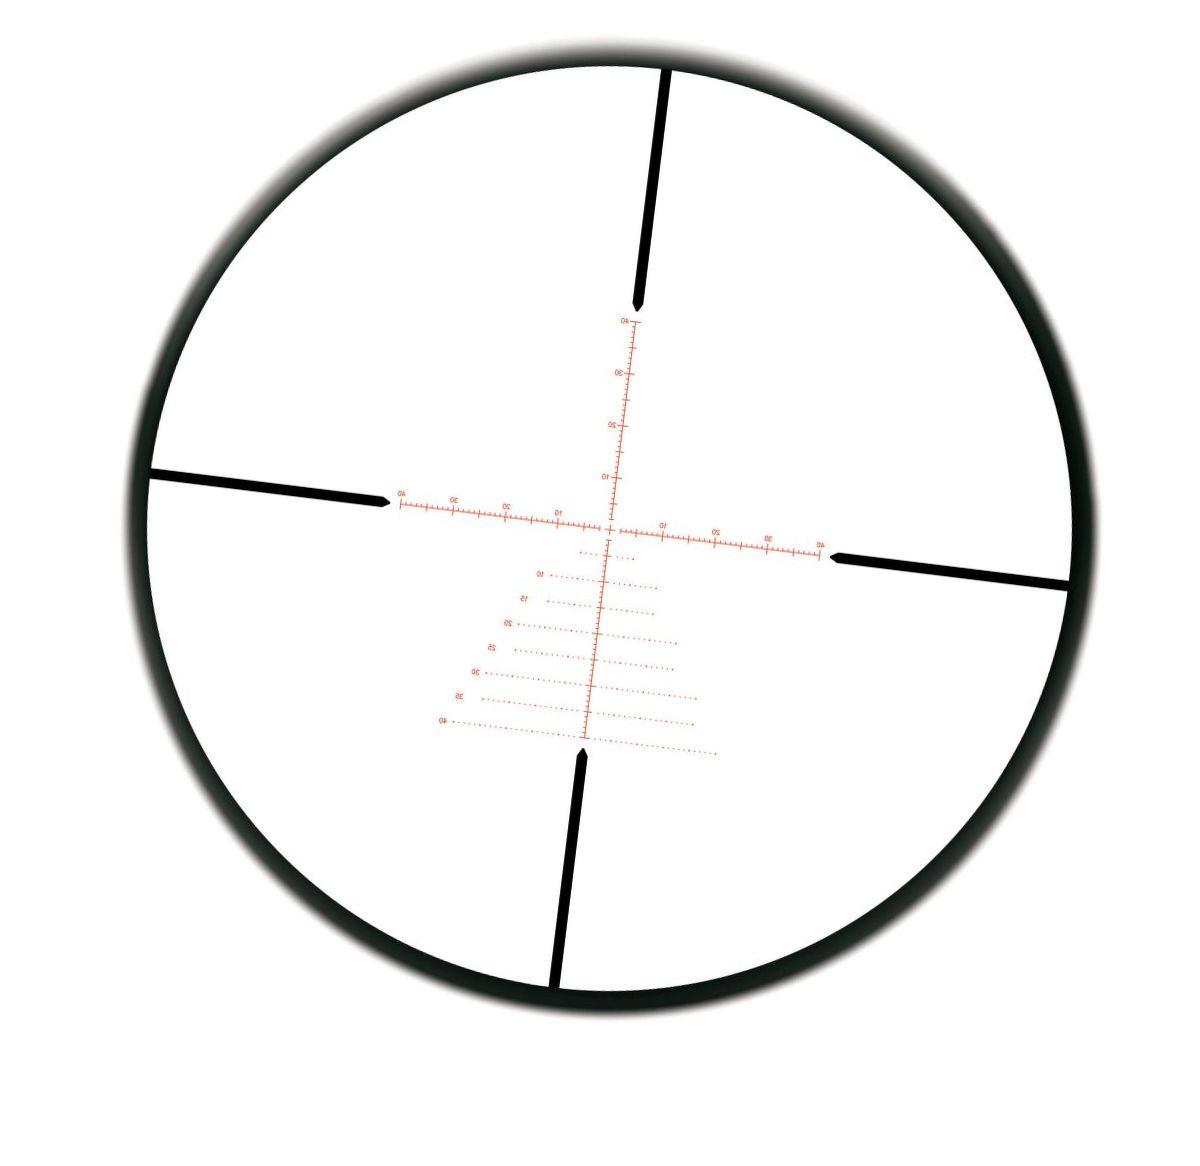 Athlon Helos BTR FFP Riflescopes